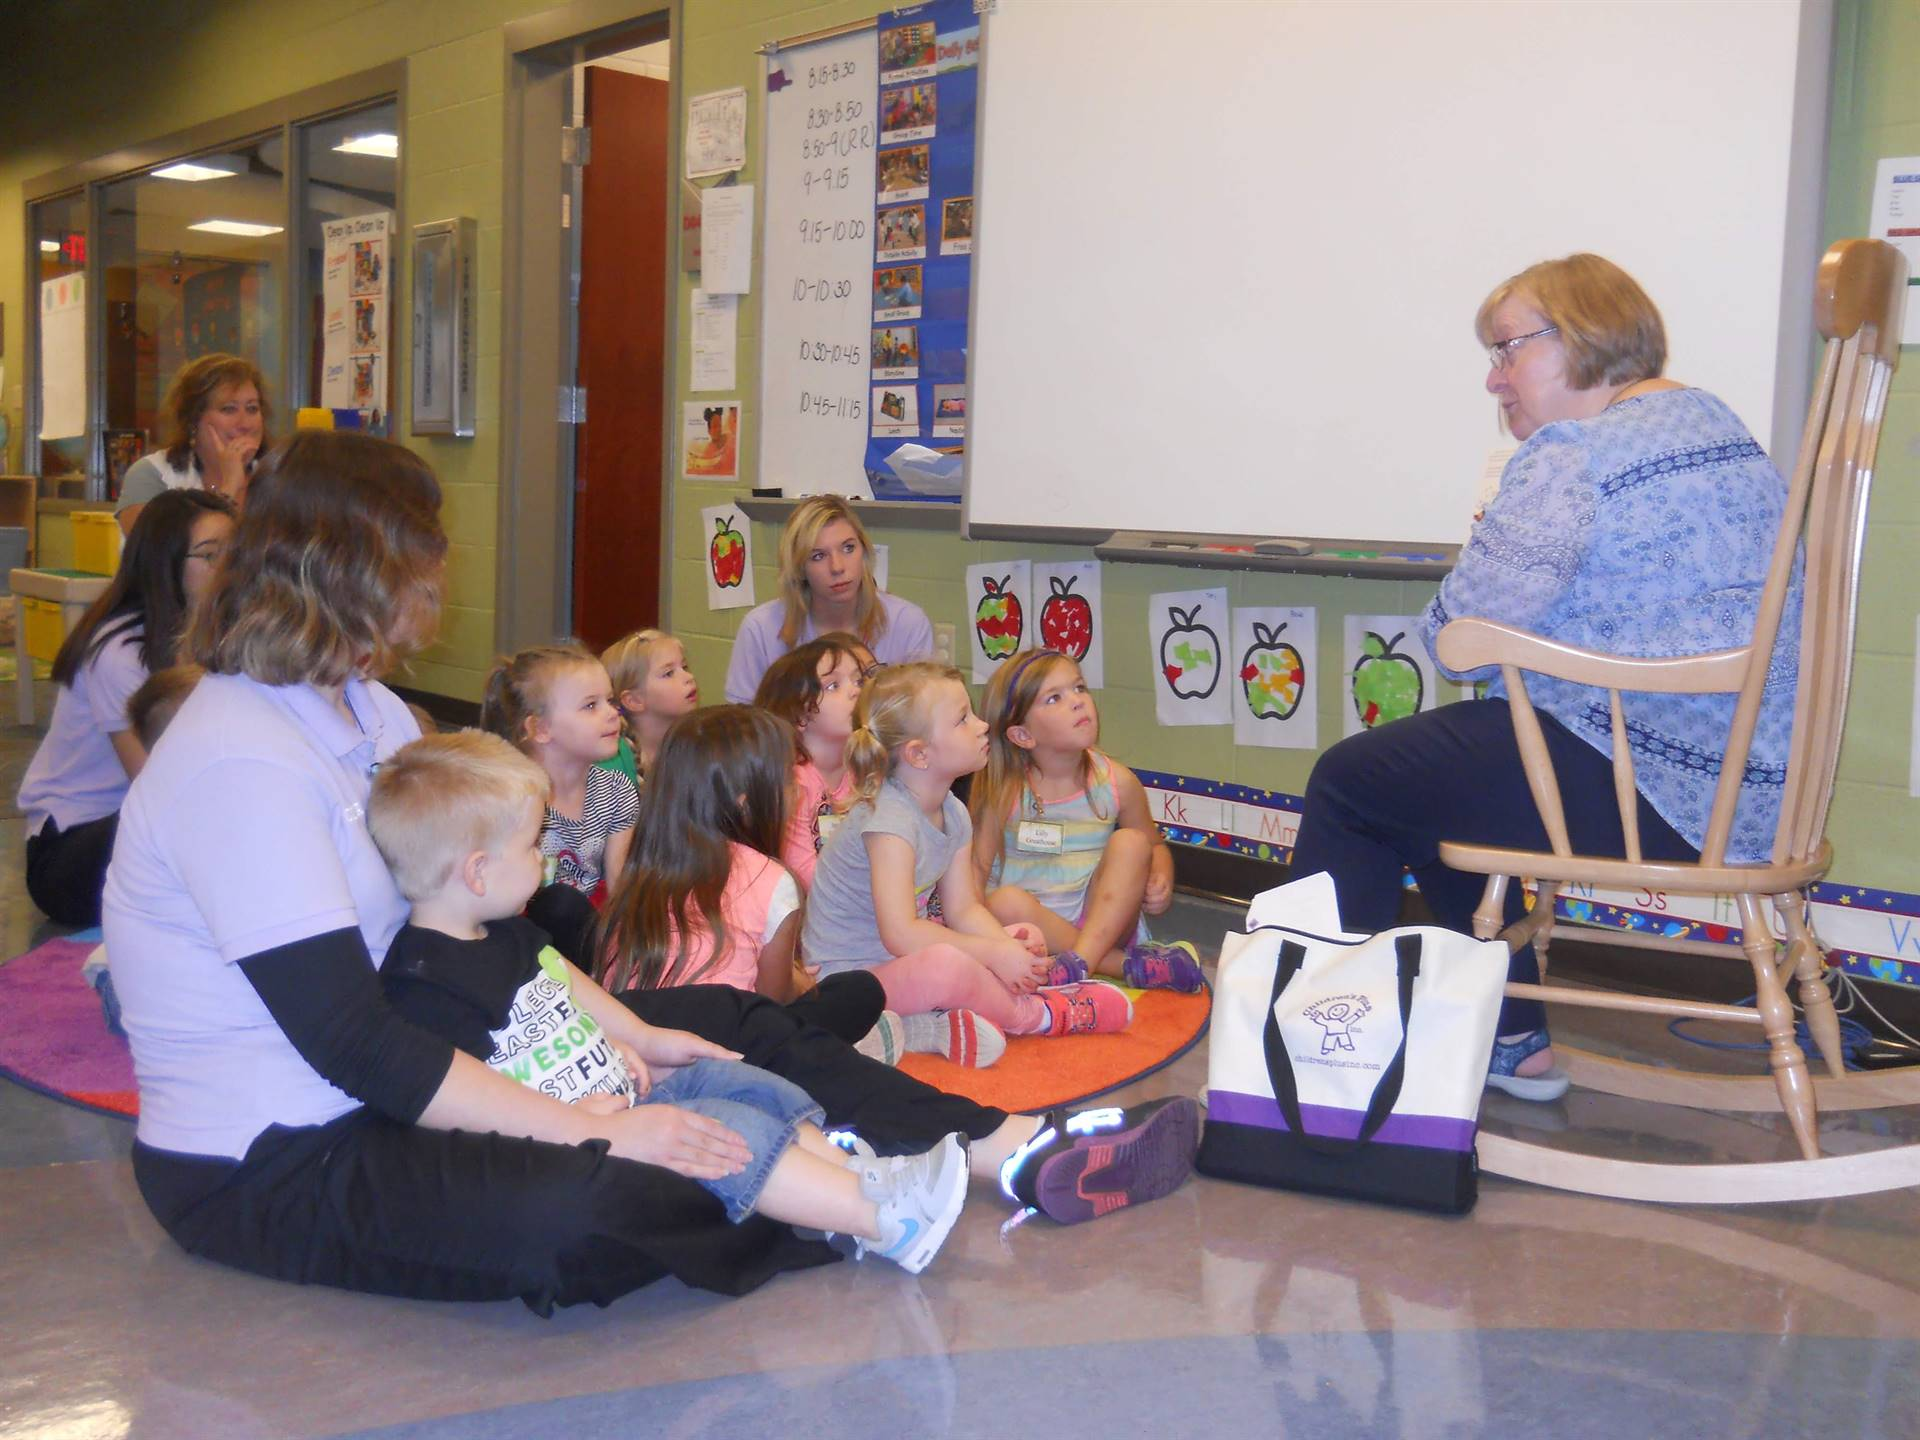 Brumback Librarian reads to preschool children.